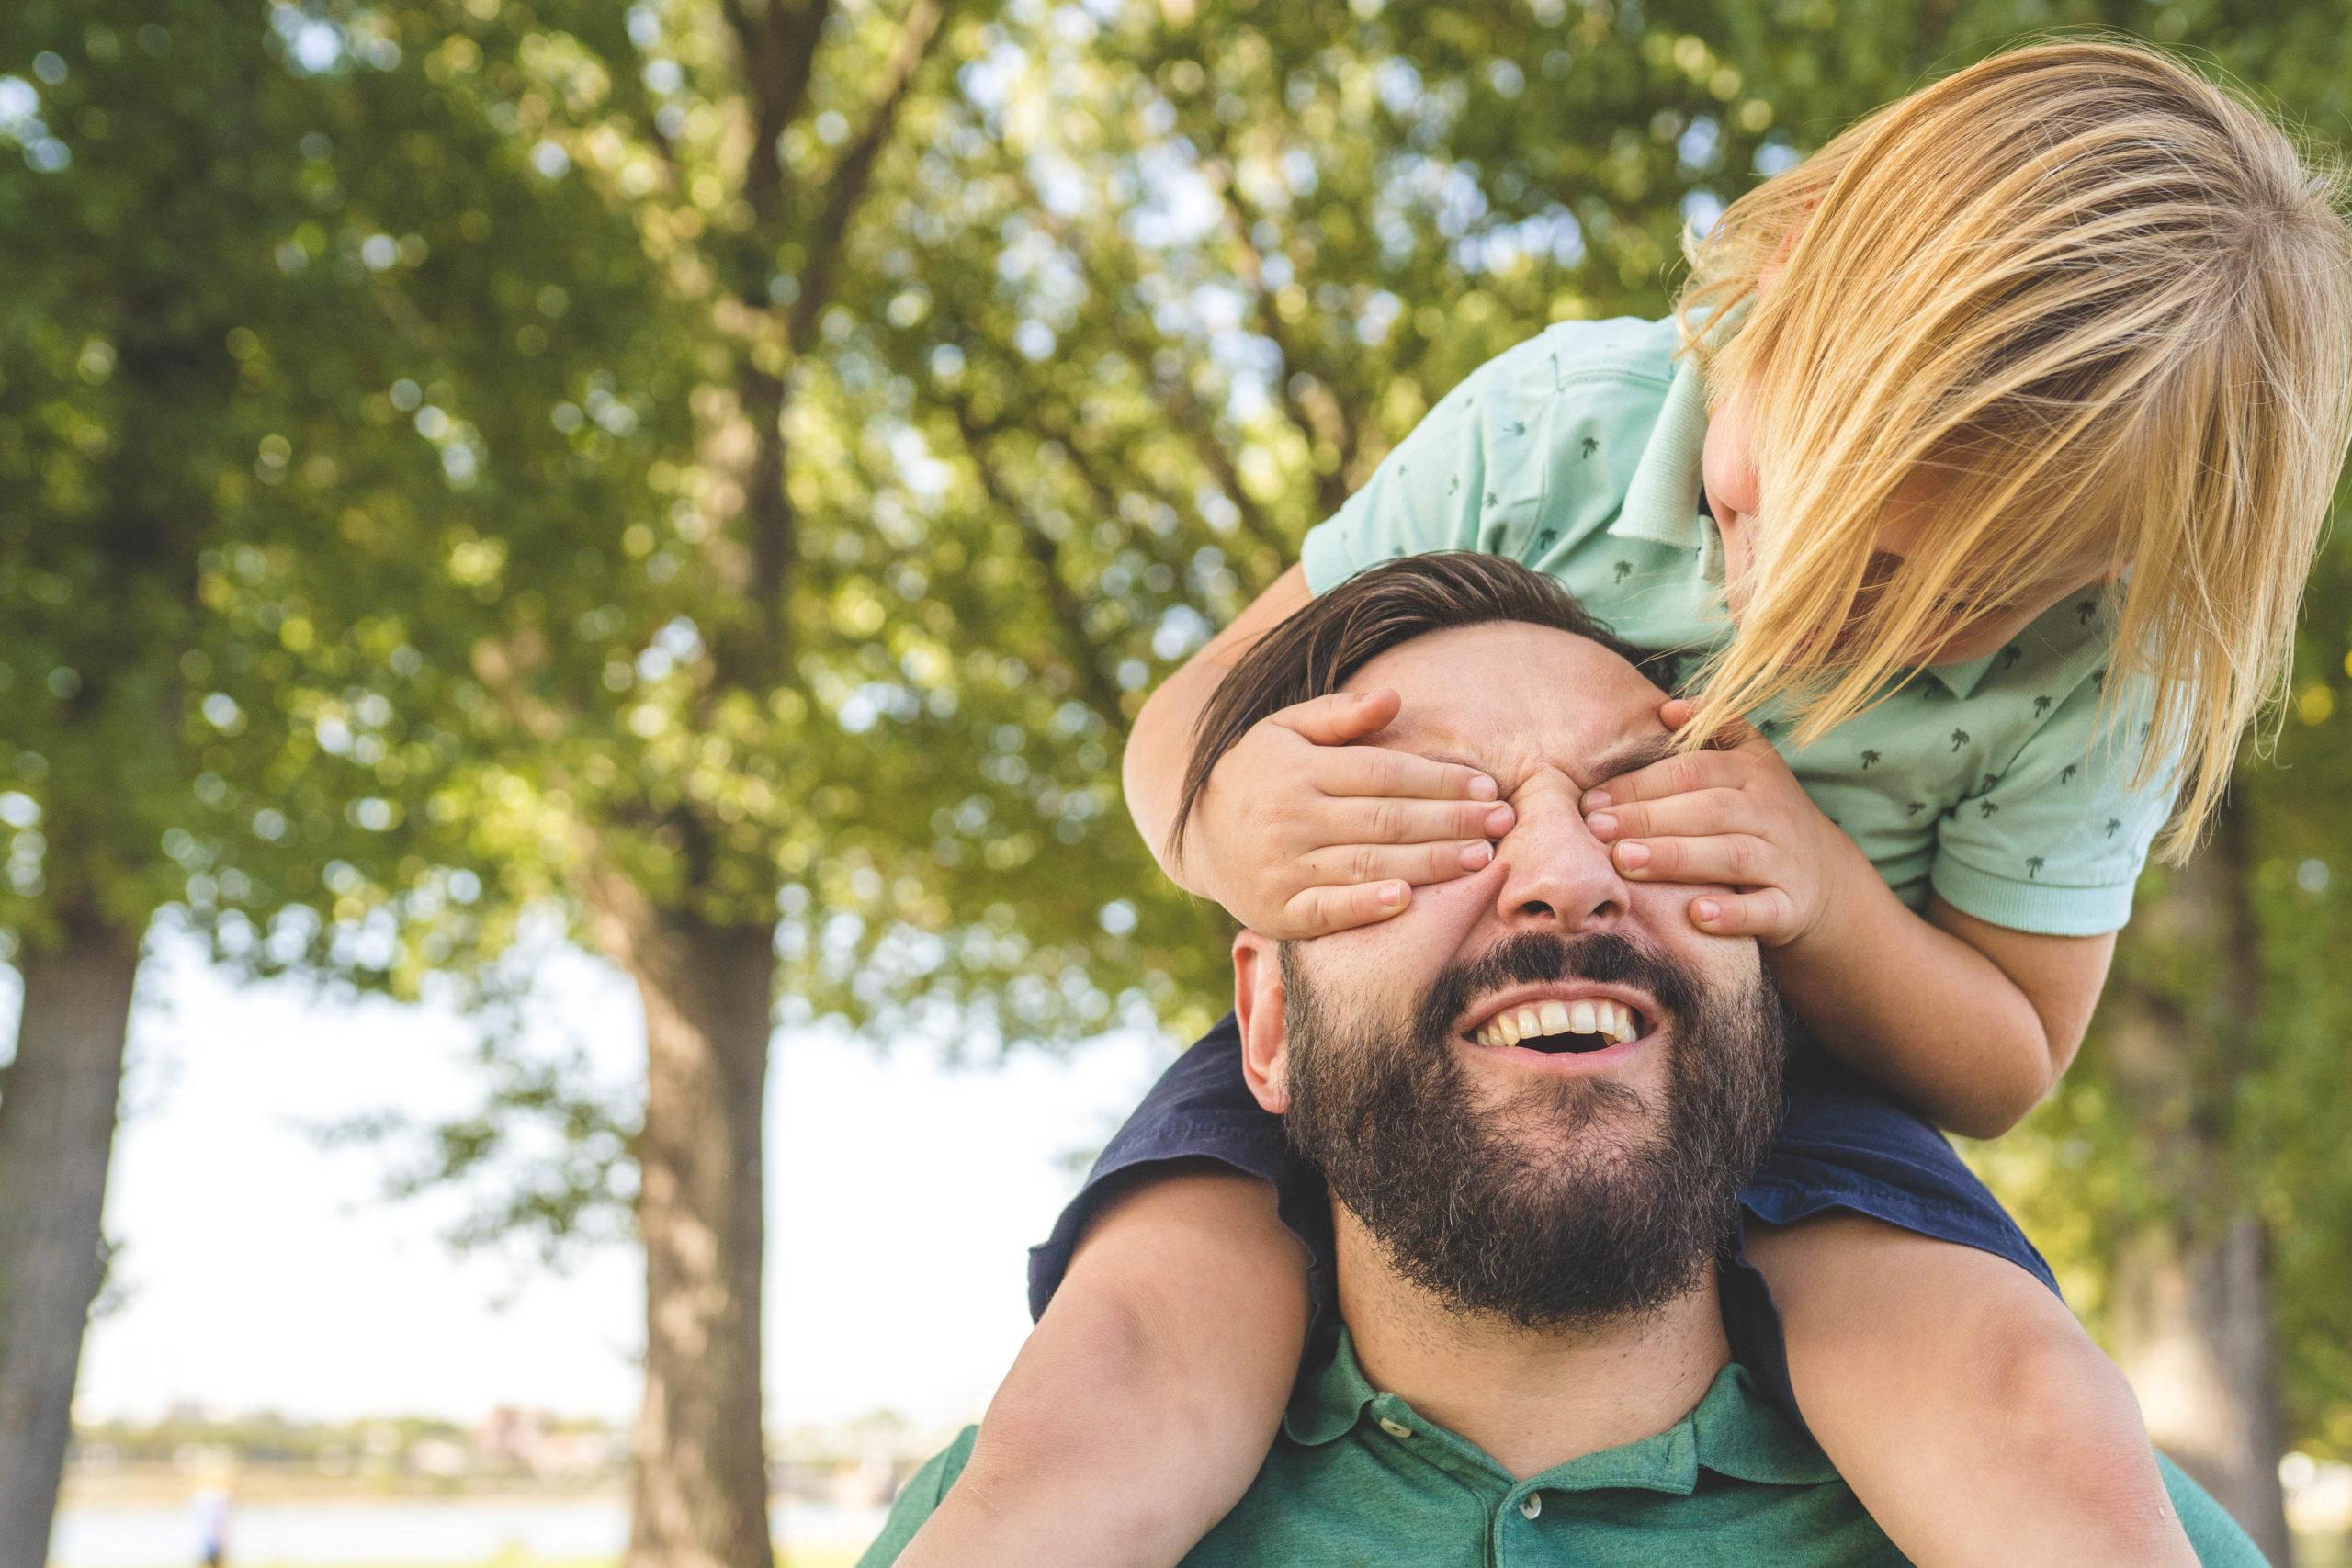 Familienfotos, Outdoorshooting, Familienfotograf, Familienfotografie